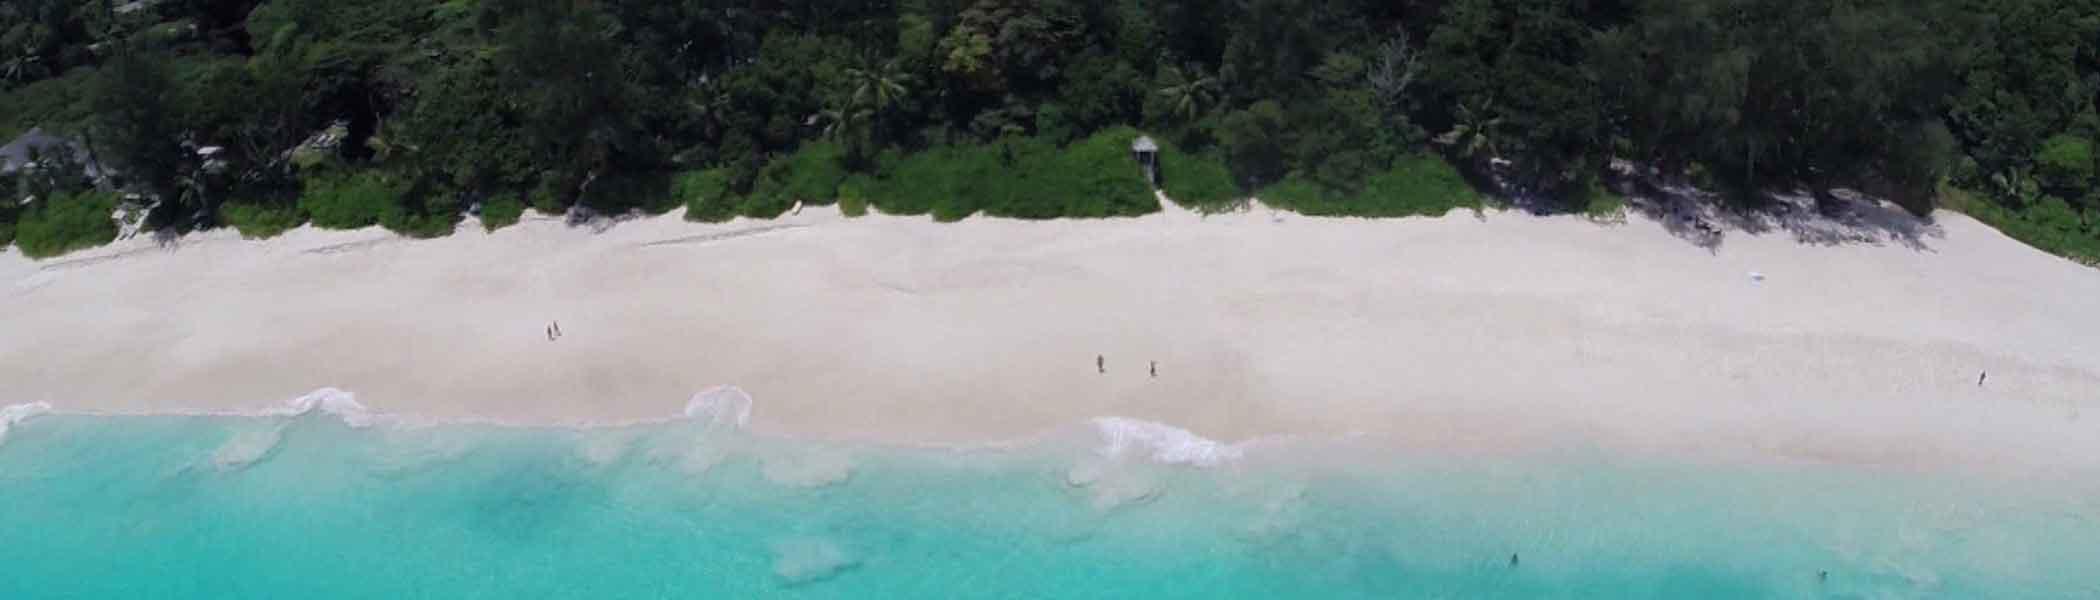 anse-intendance, Beaches in Seychelles Islands